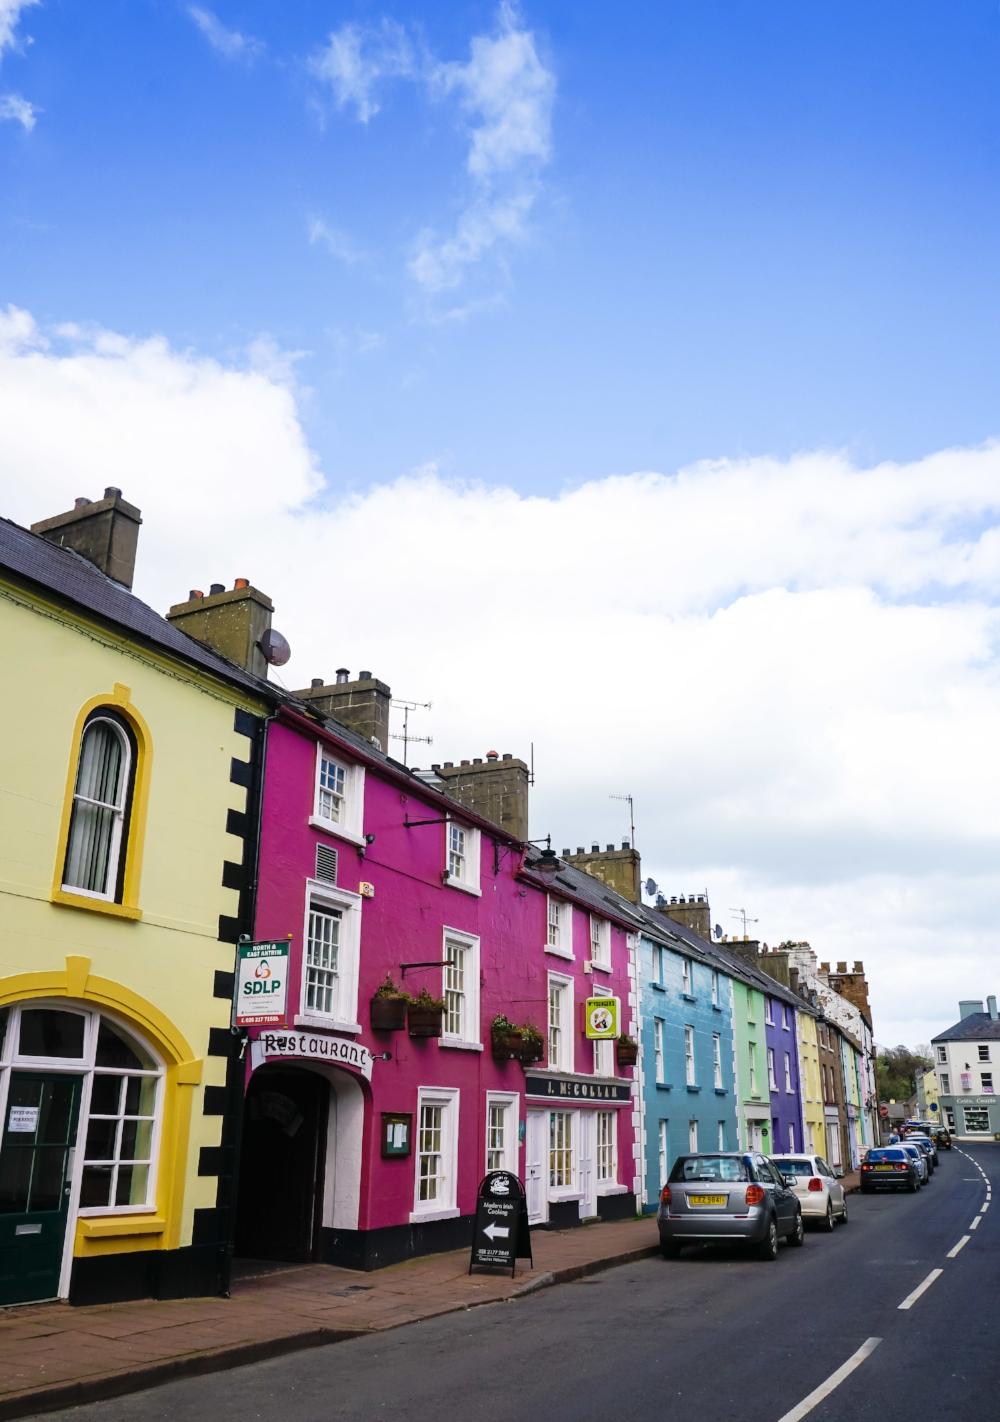 curio.trips.ireland.village.colourful.street.scenes-2.jpg